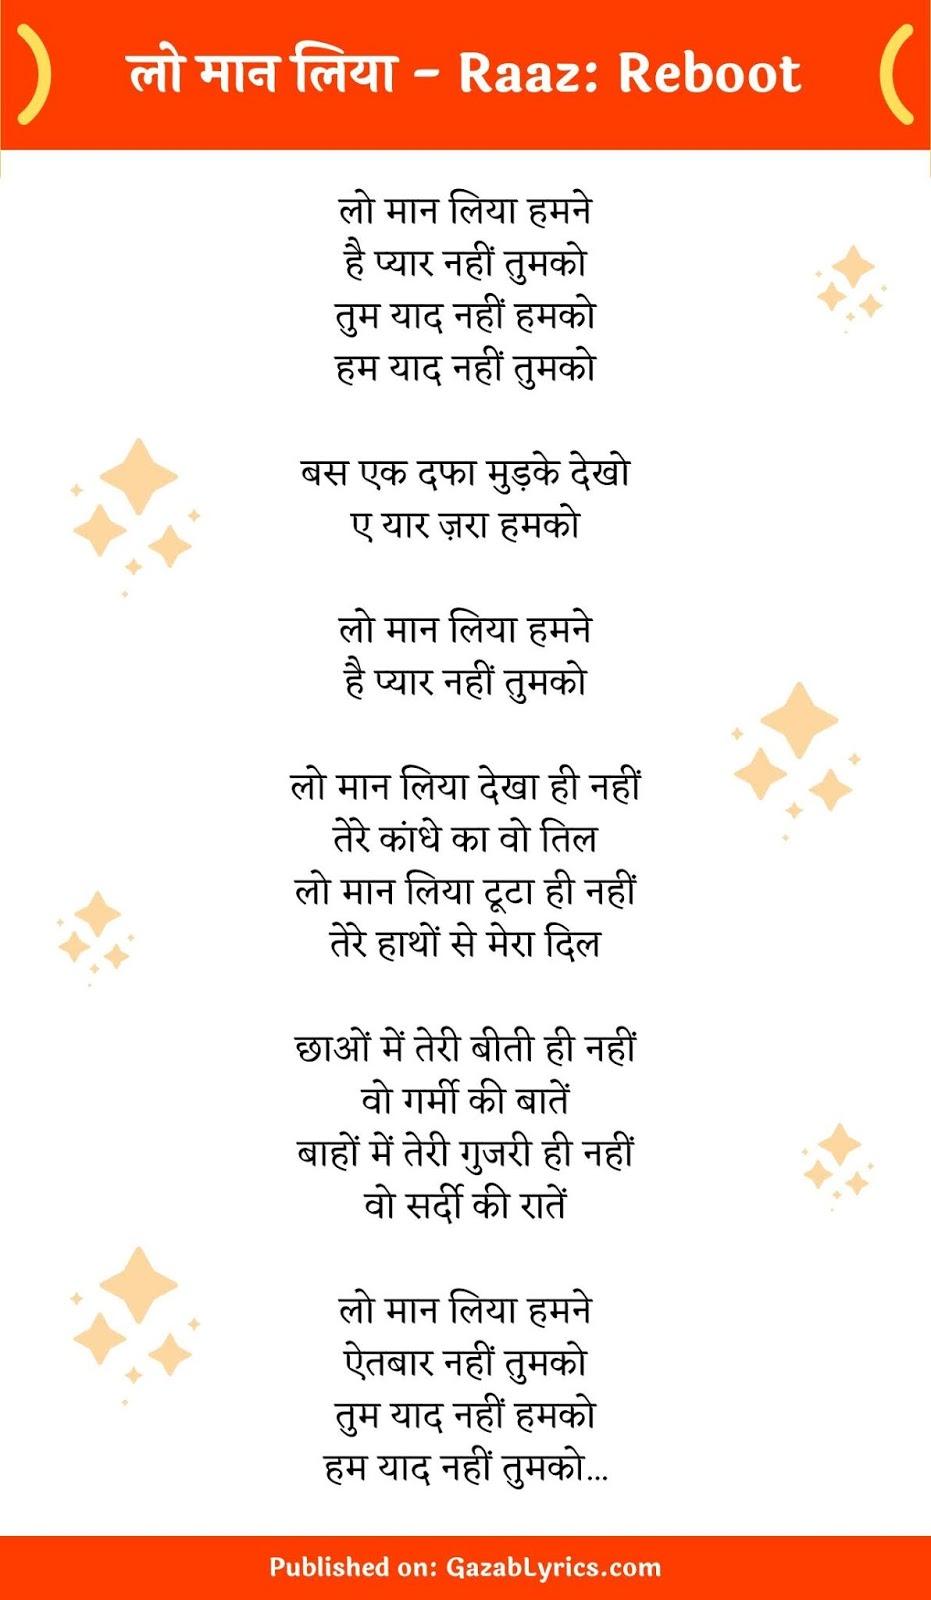 Lo Maan Liya song lyrics image